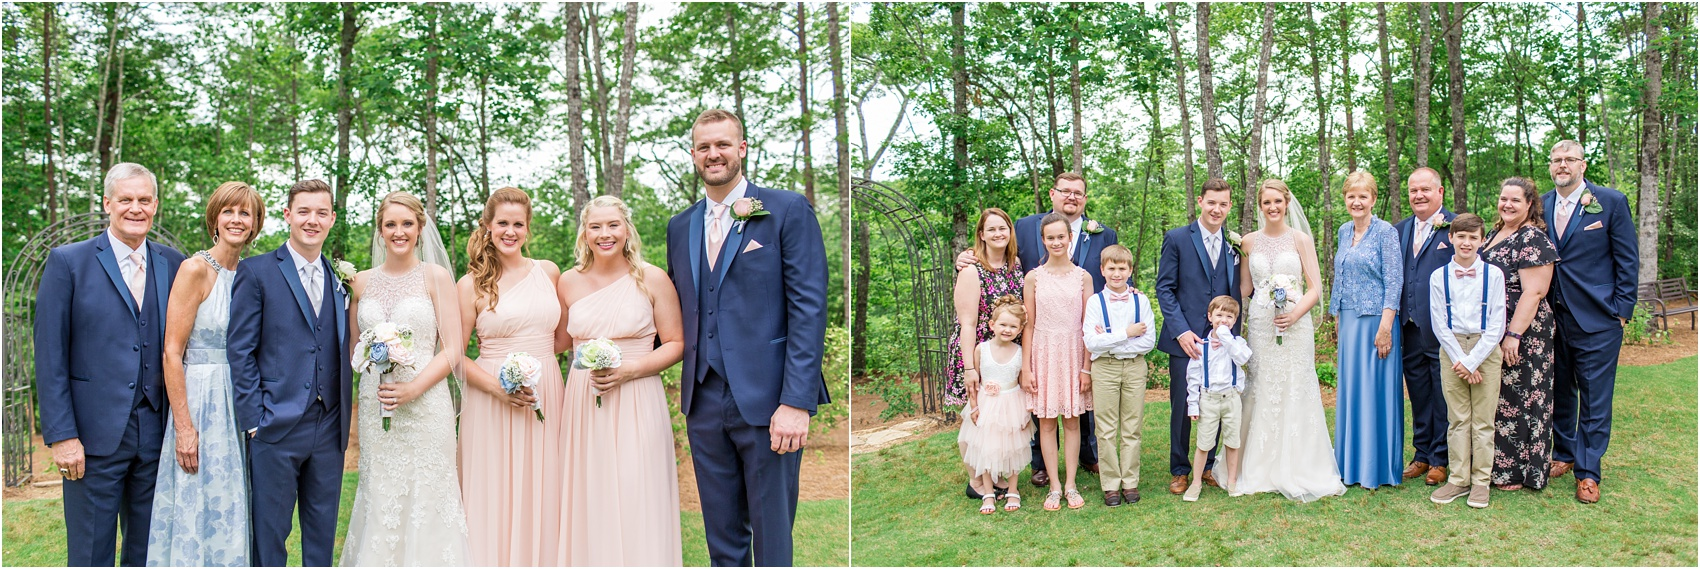 Savannah Eve Photography- Roper-Powell Wedding- Blog-37.jpg